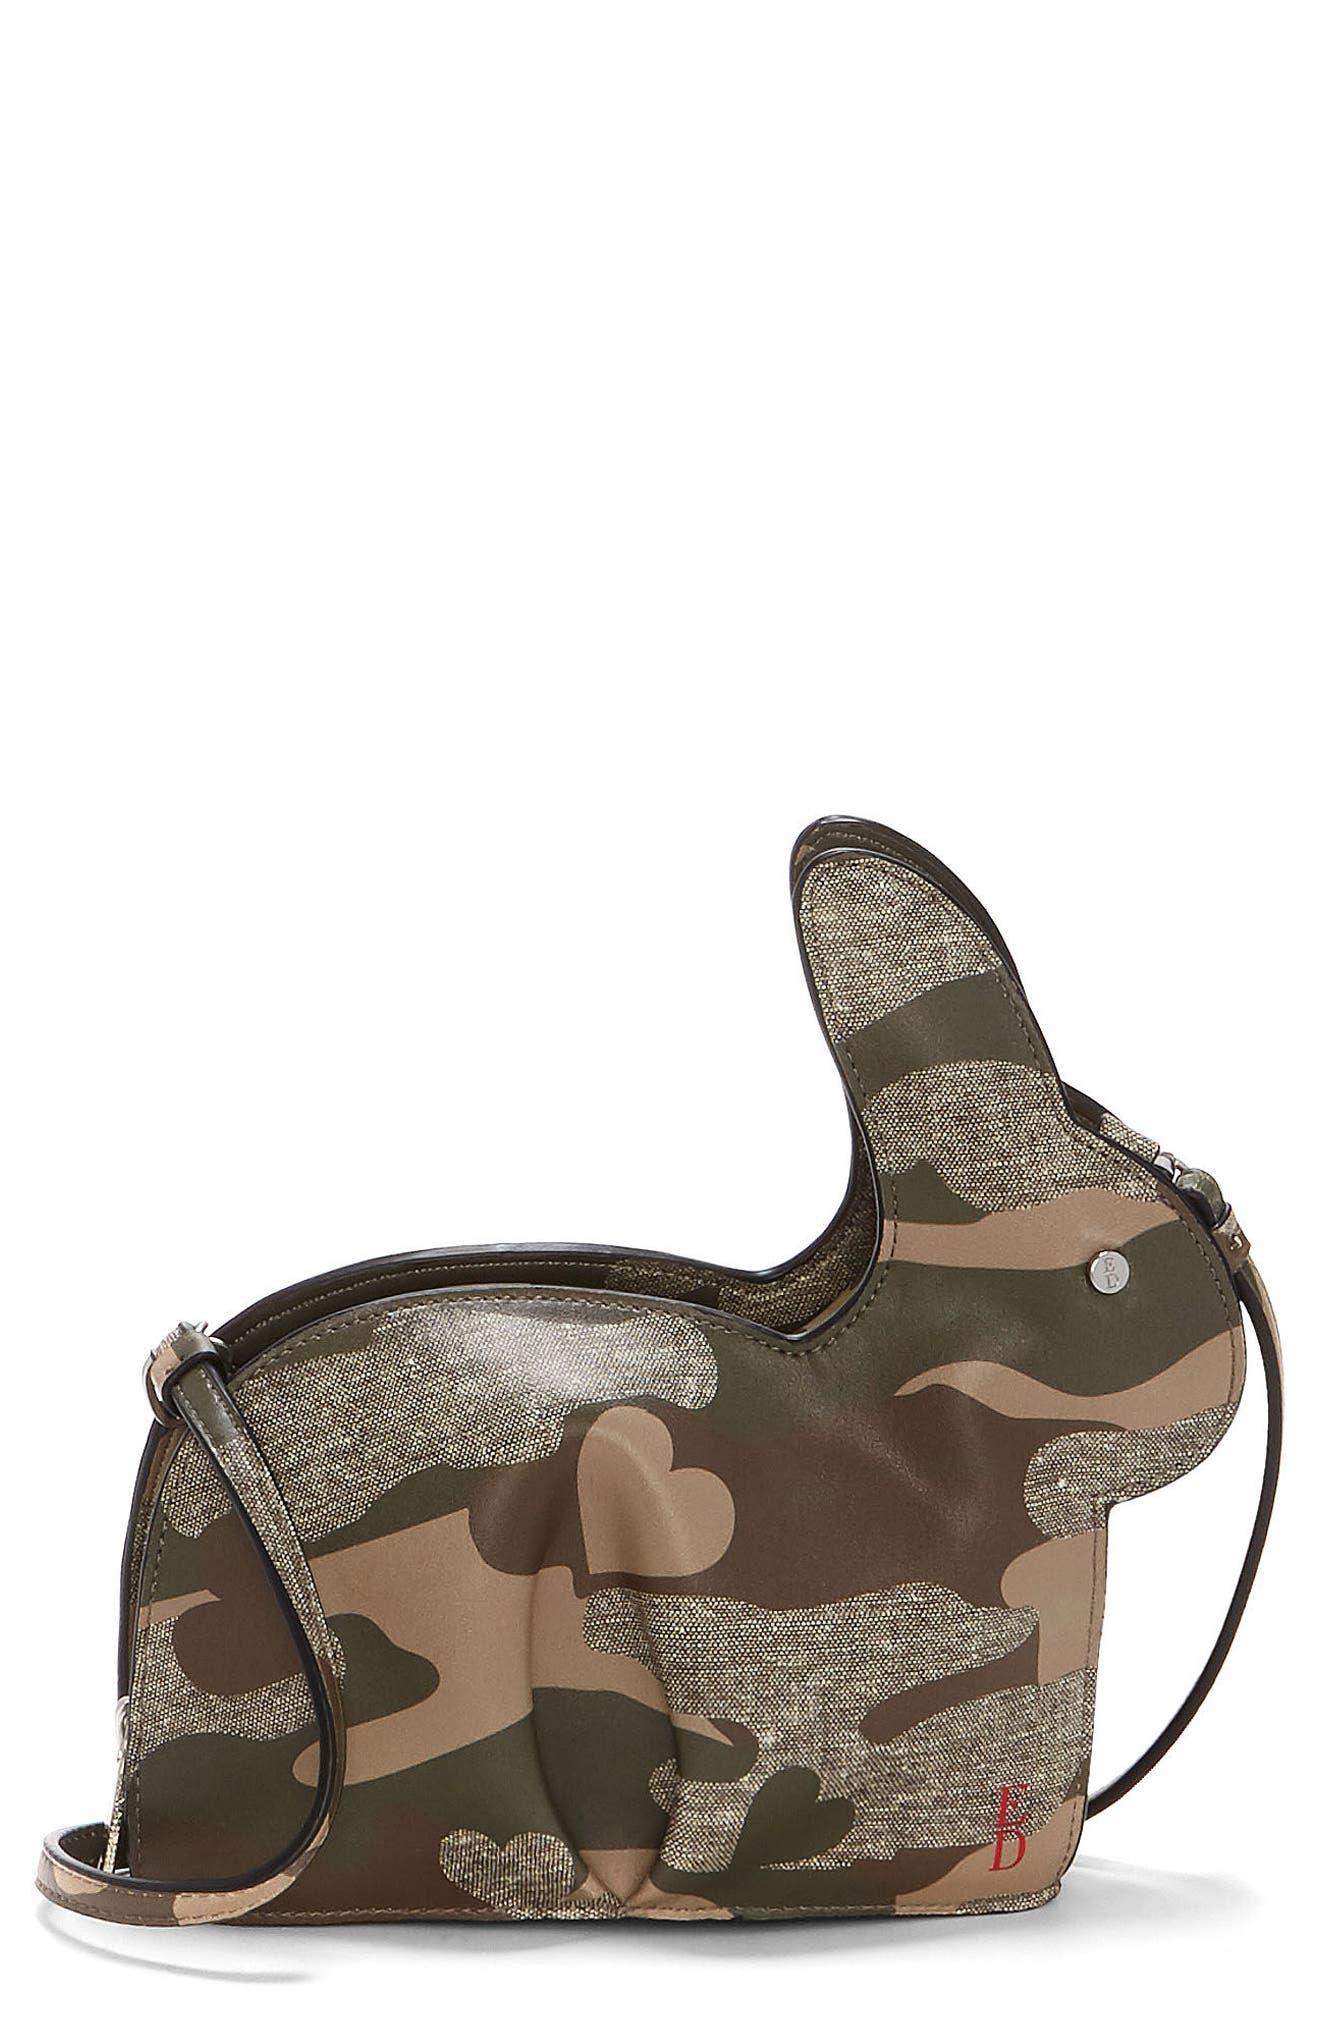 Carot Faux Leather Crossbody Bag,                         Main,                         color, 300